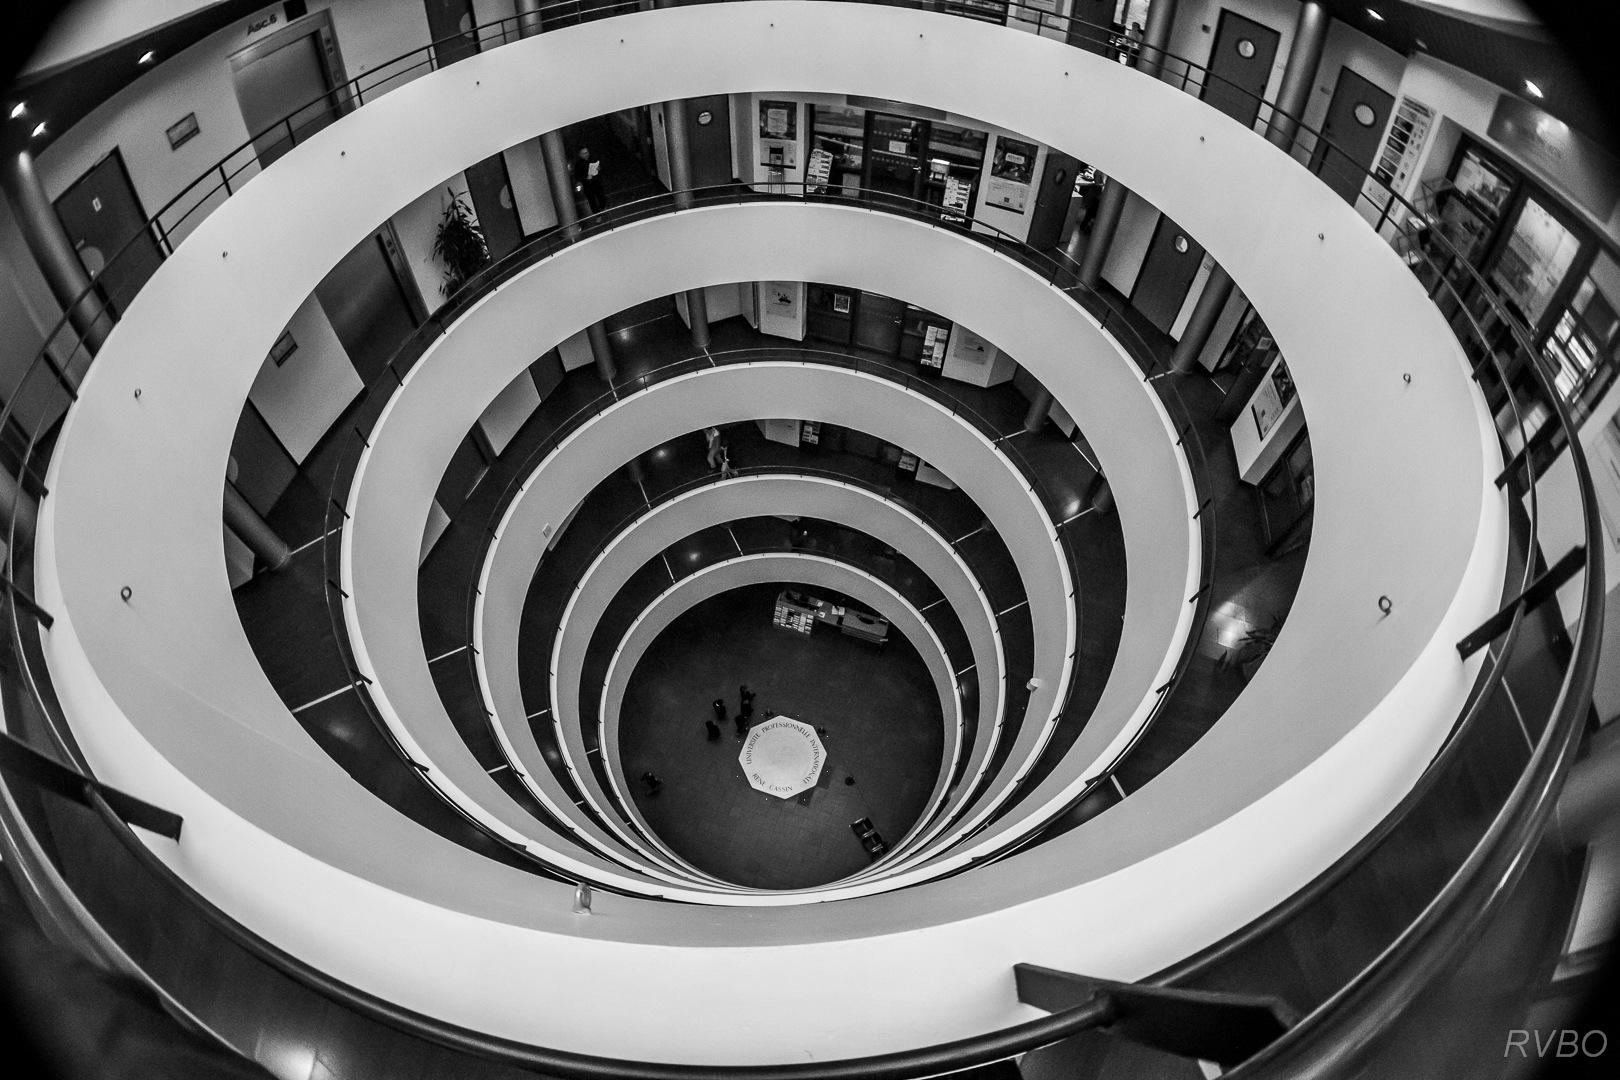 l'atrium by RVBO